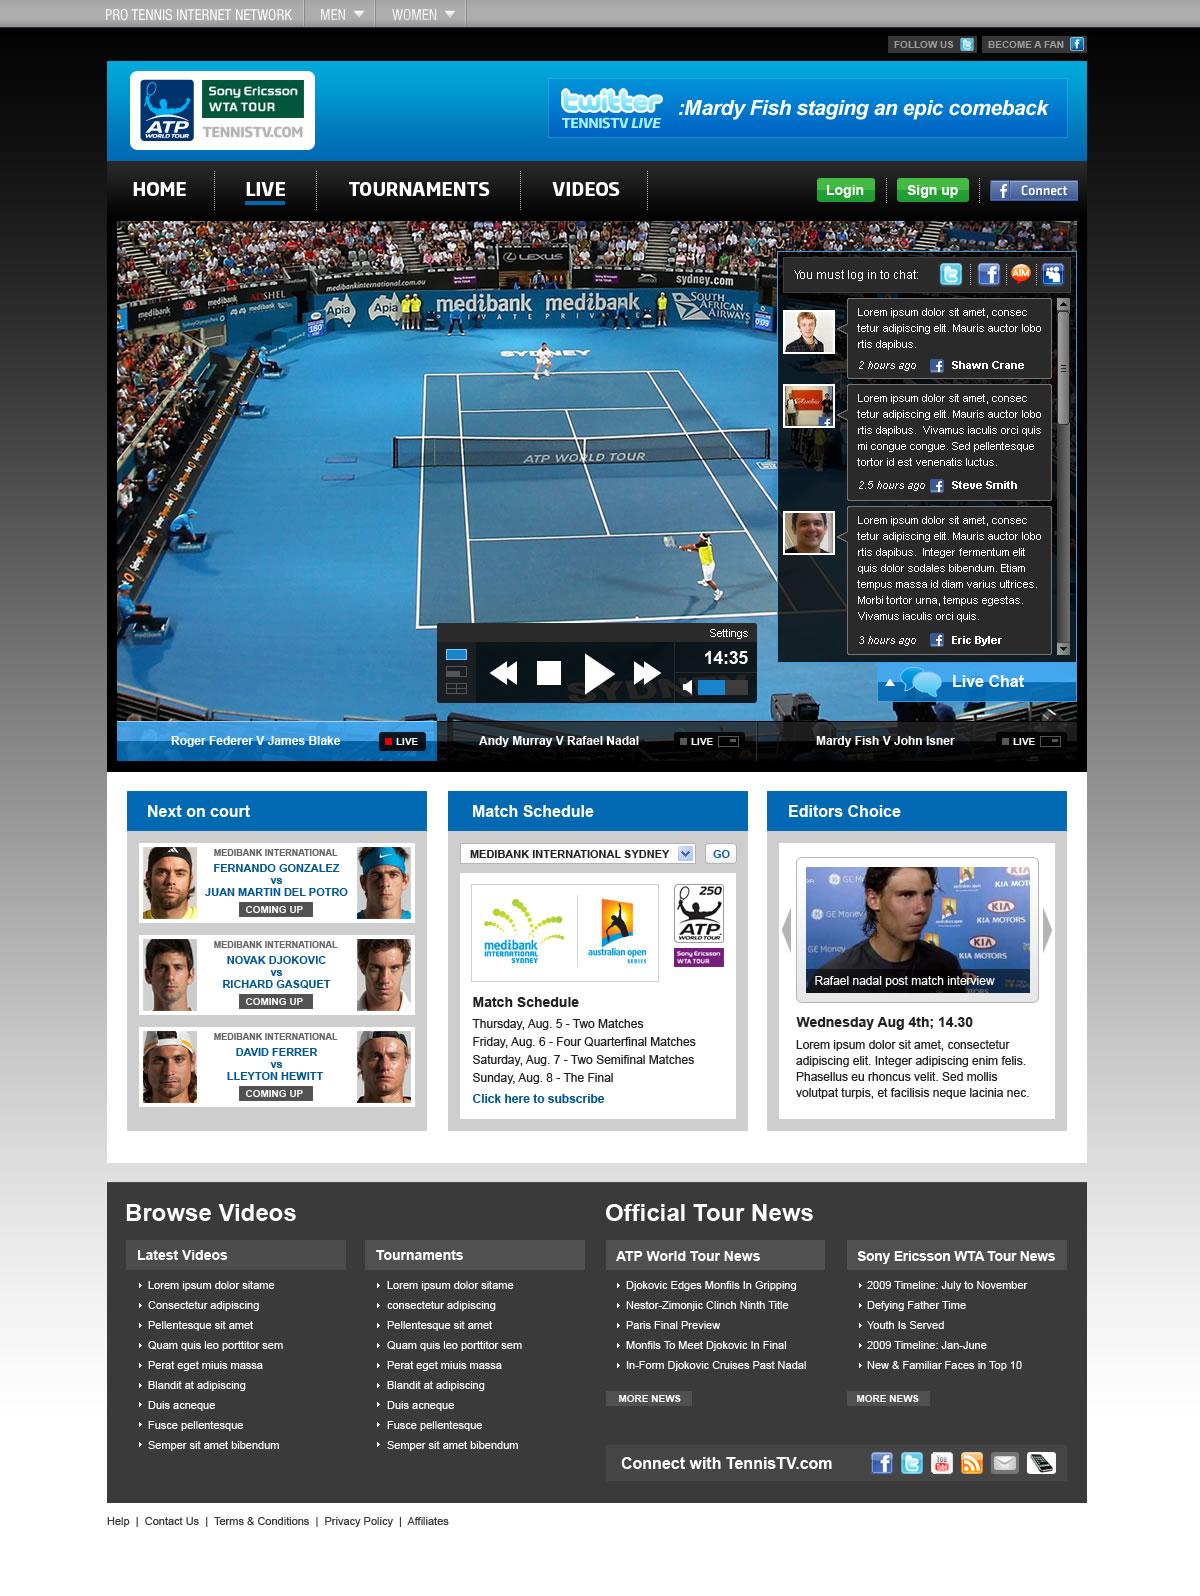 tennisTV_live_chat_view